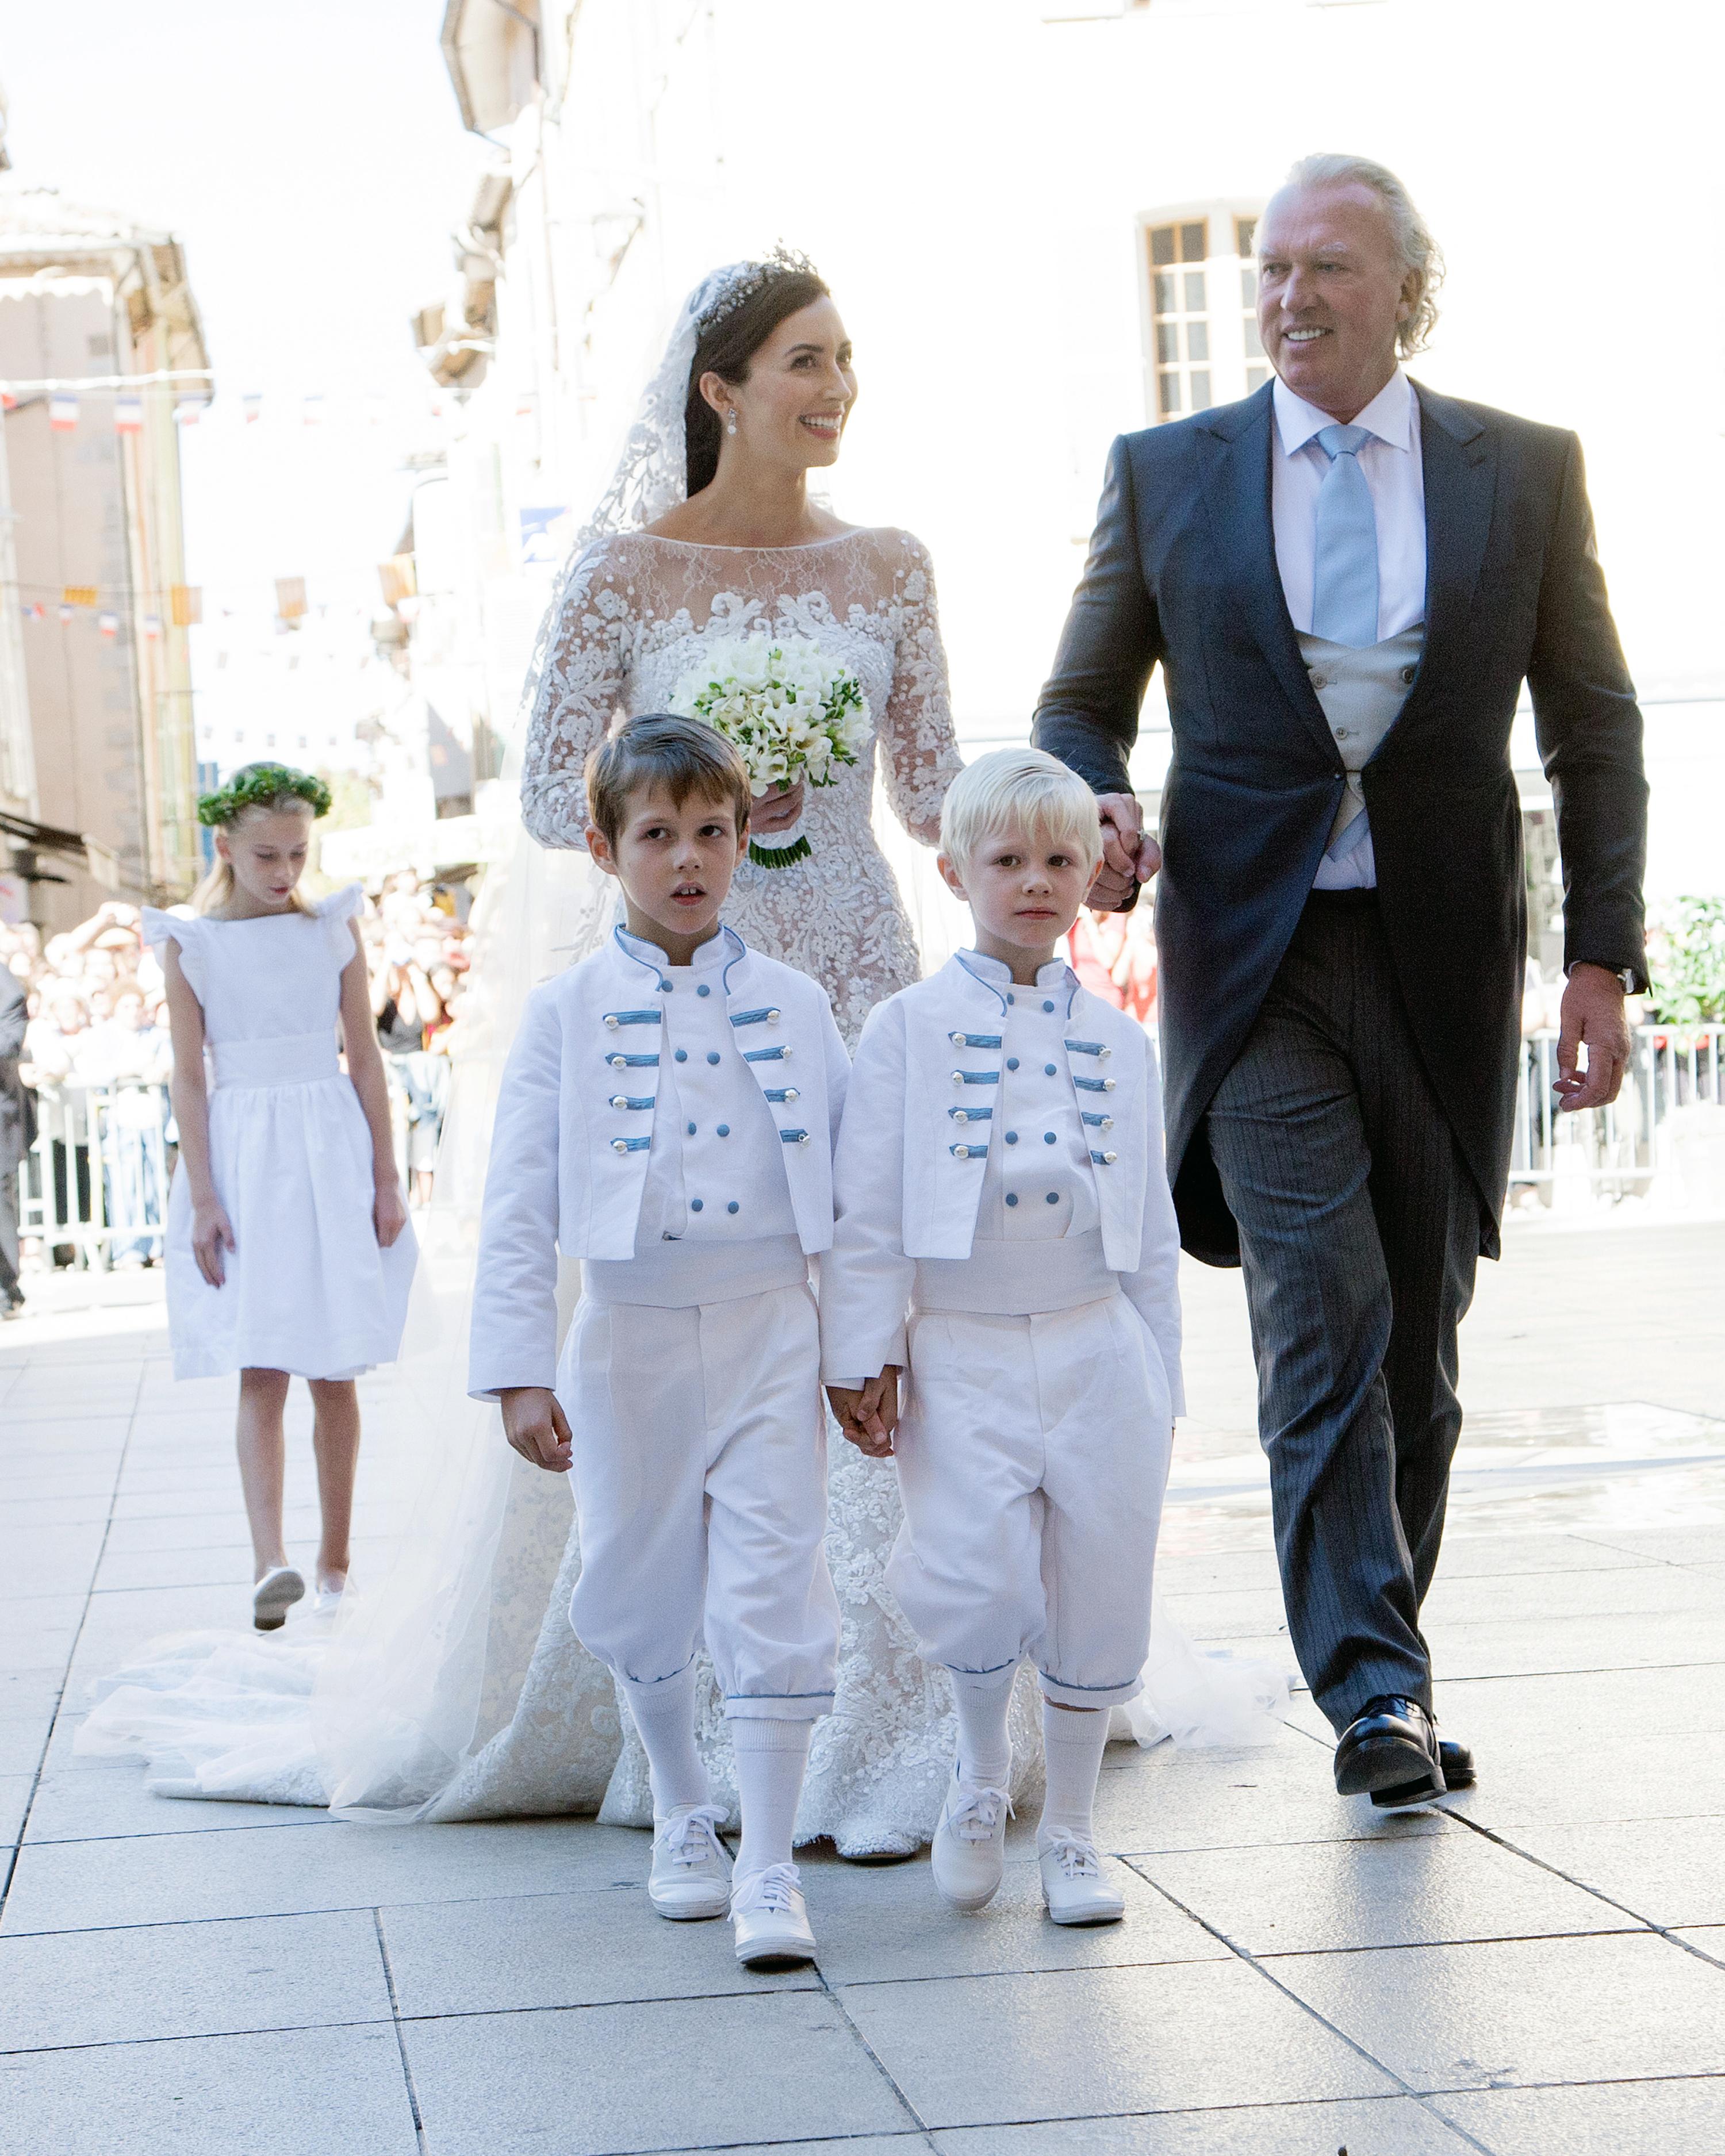 royal-children-wedding-181443548_master-0415.jpg